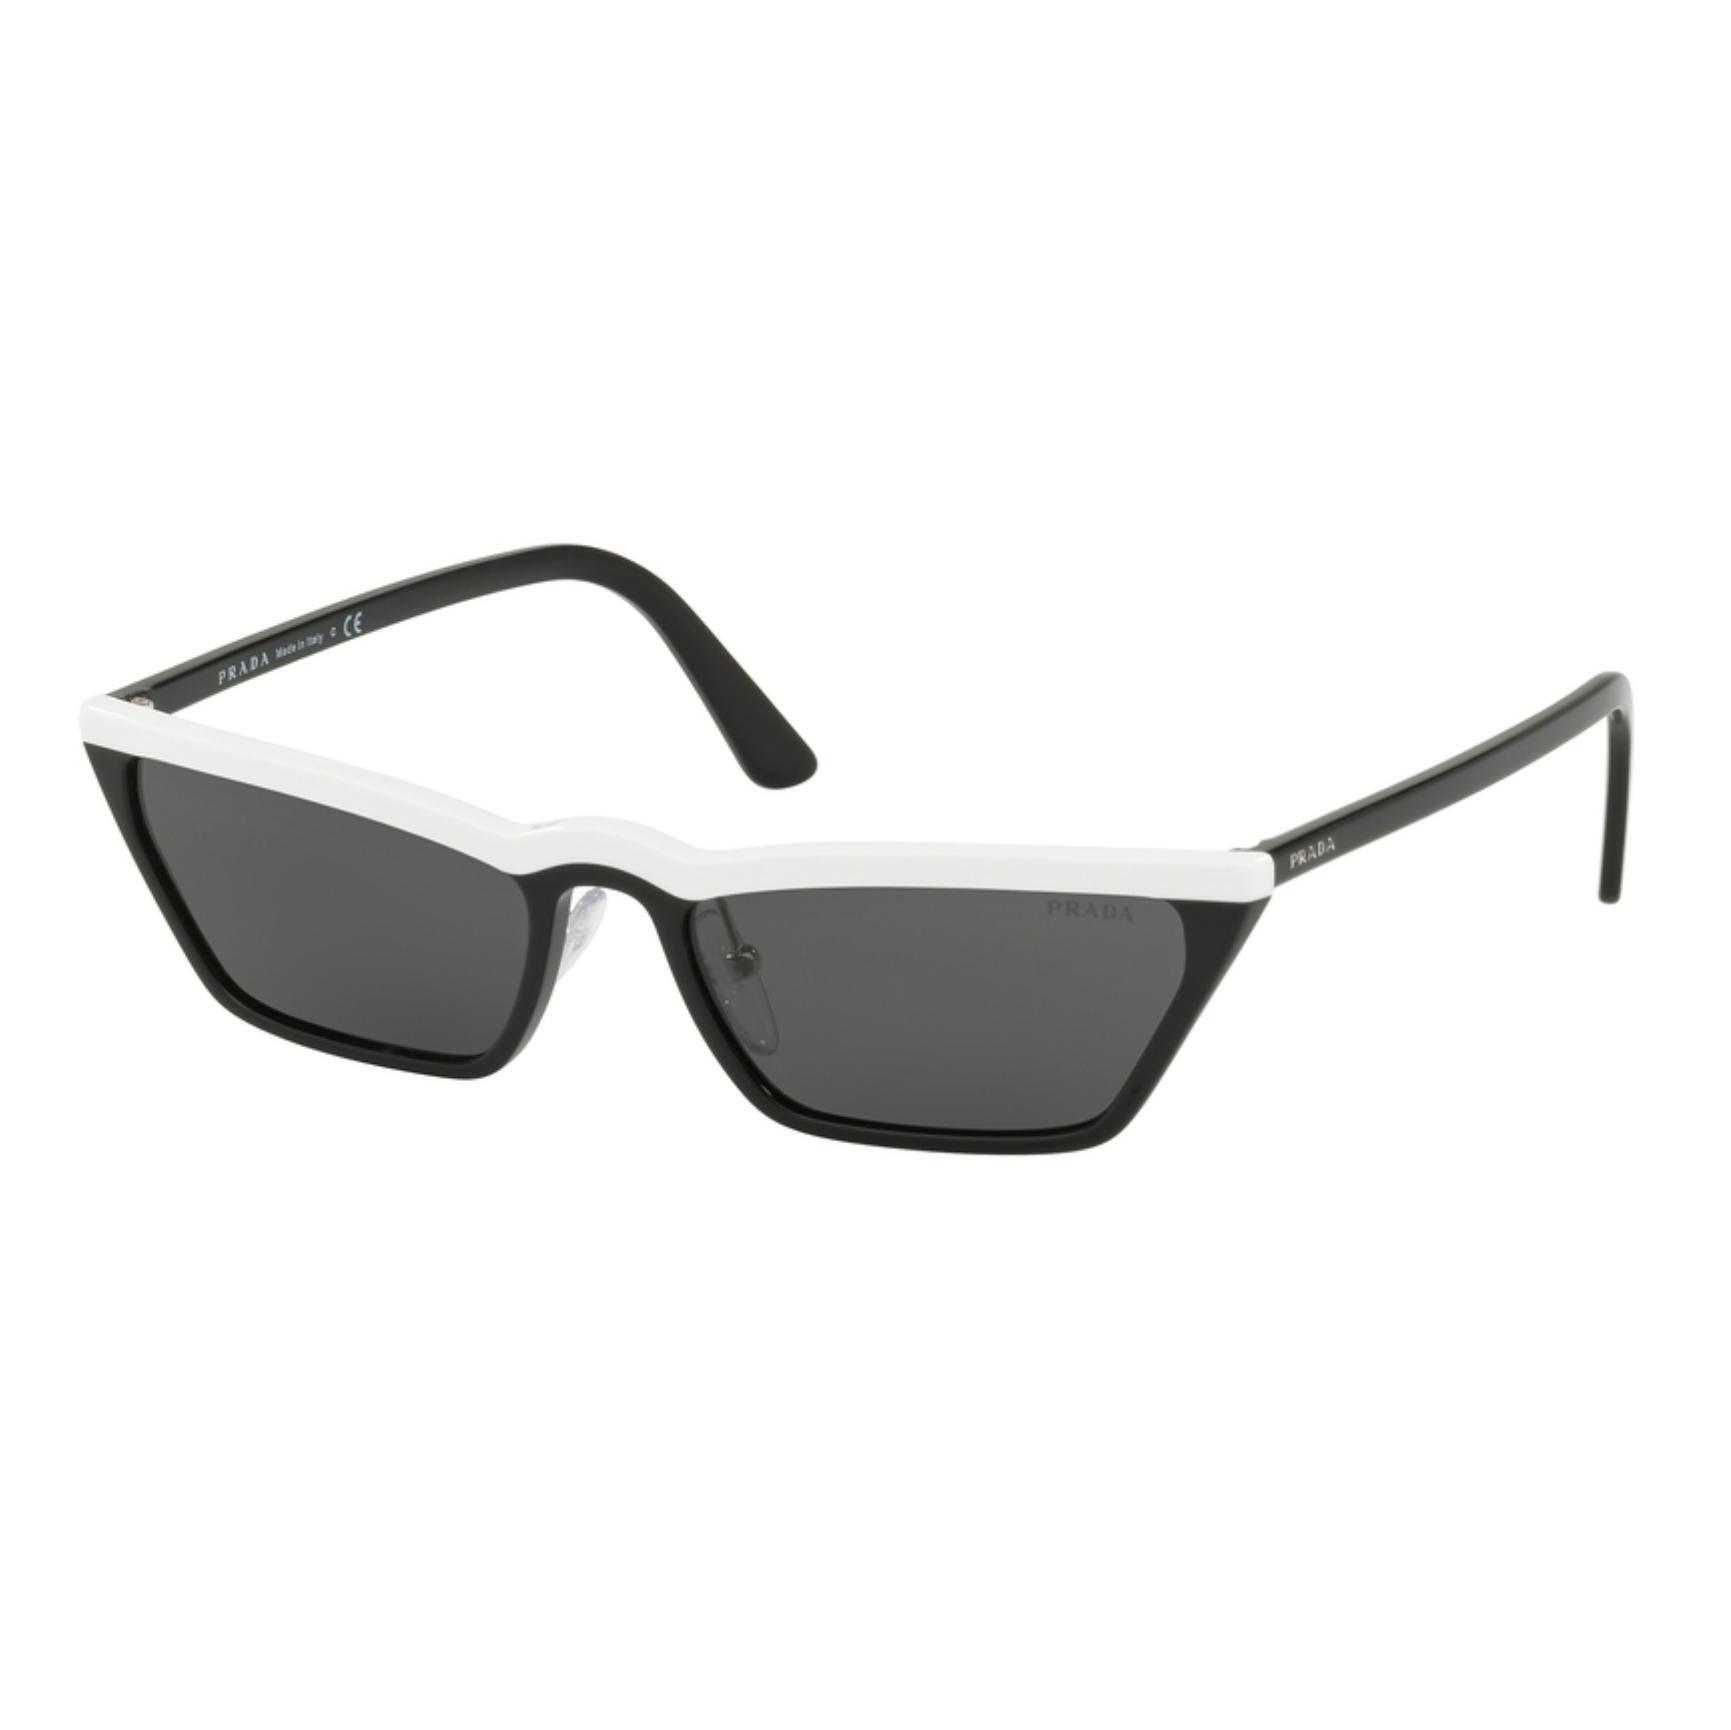 9df7f52fb9e615 Shop Prada SPR 29U zonnebril - Optiek Lammerant Deinze